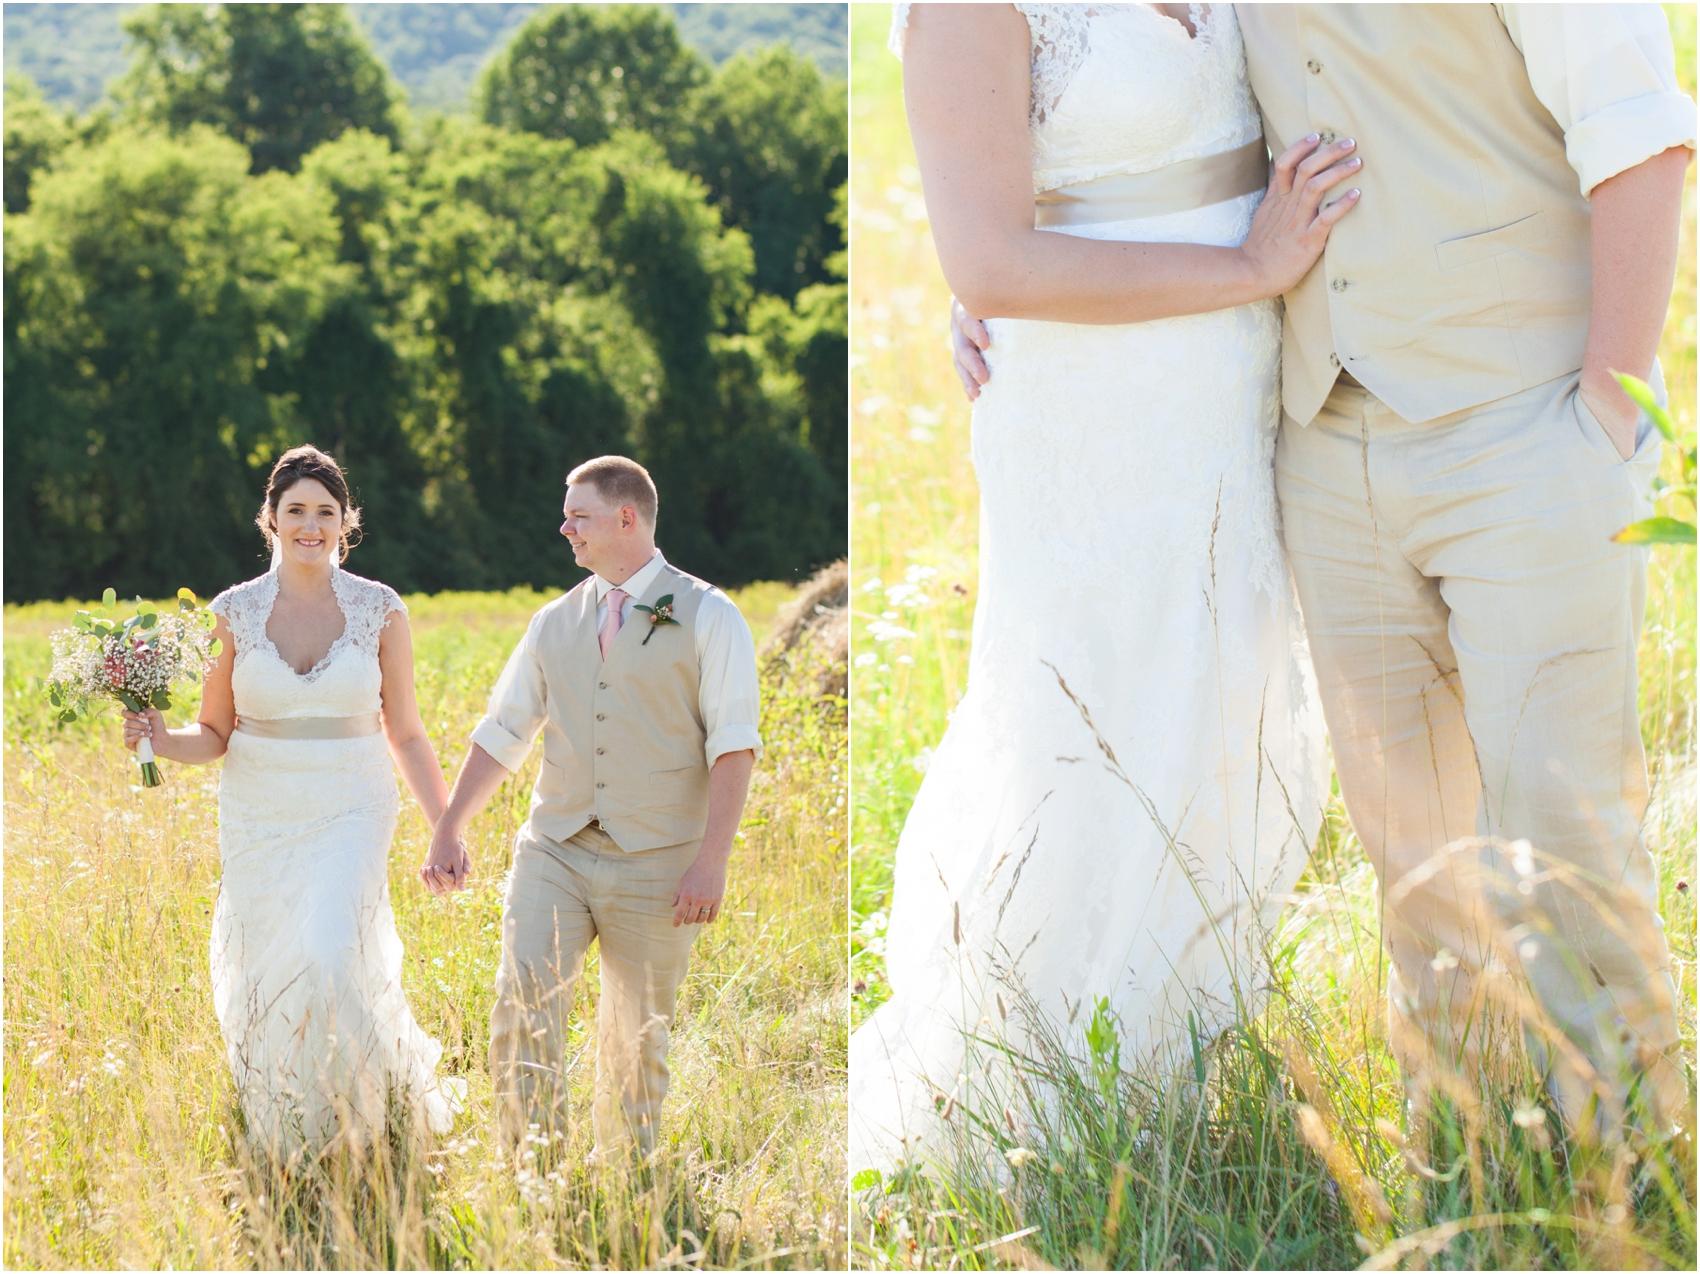 Rodes Farm Charlottesville VA Wedding-12-4.jpg